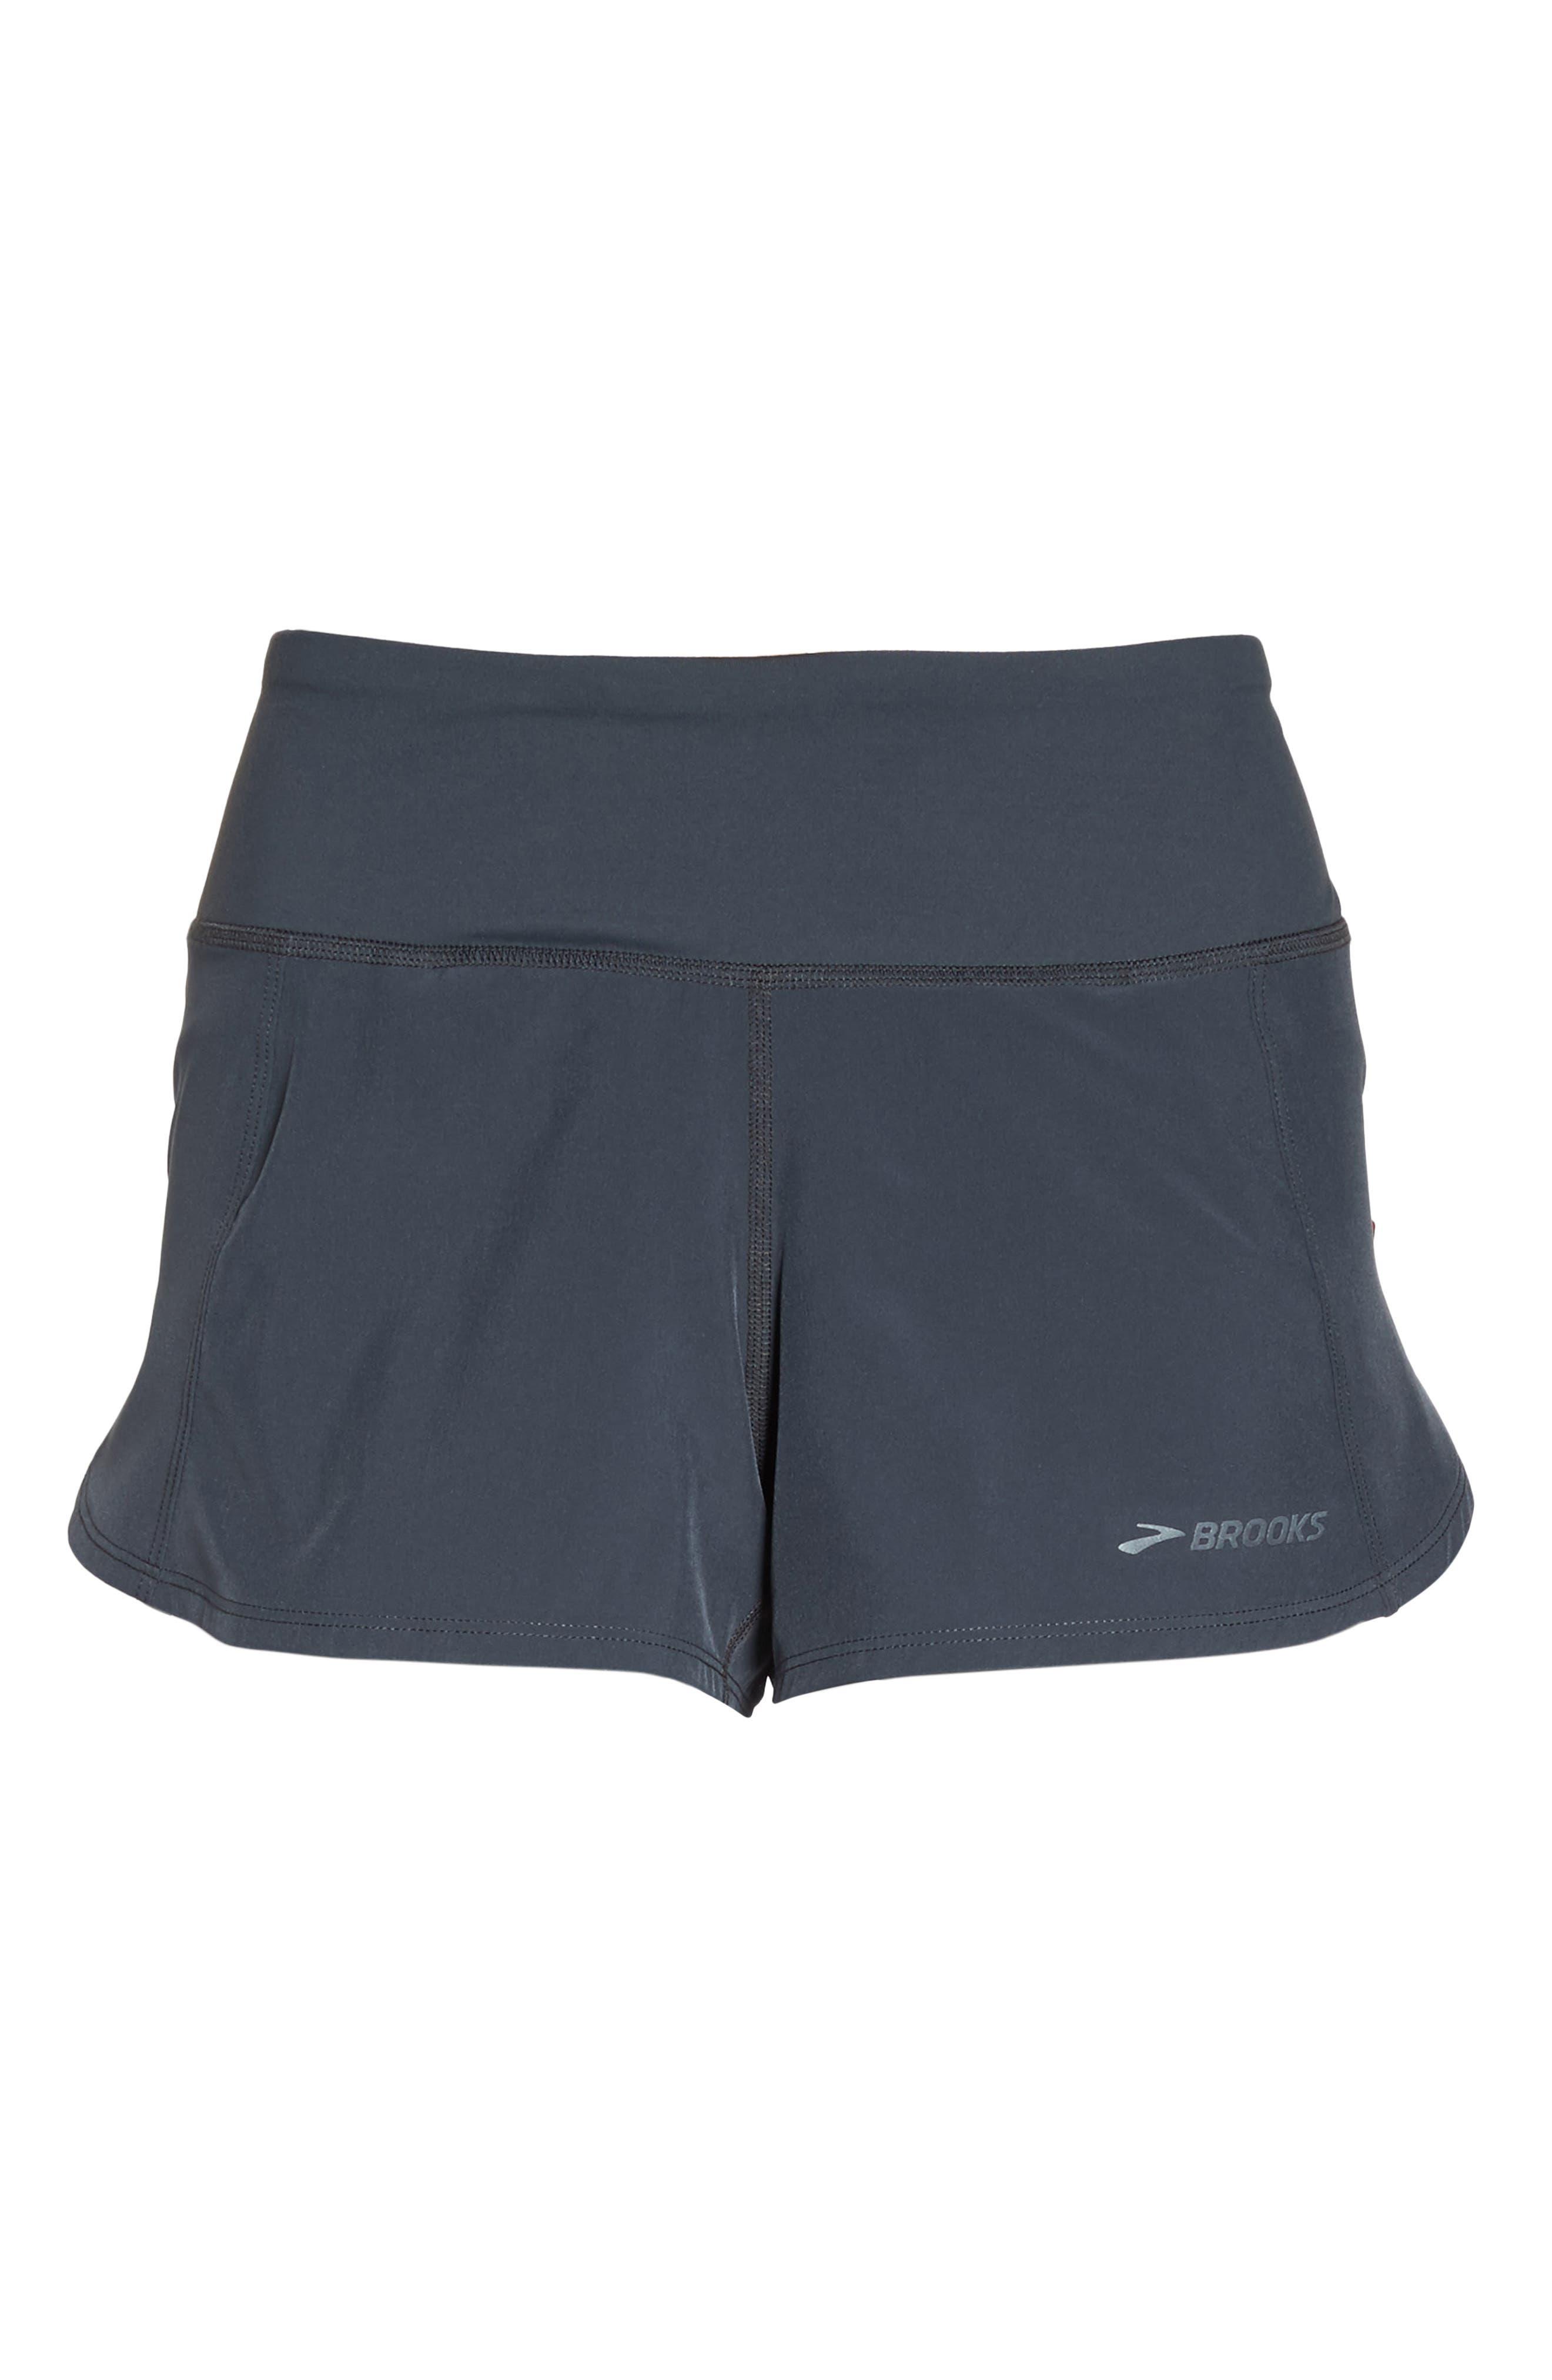 Chaser 3 Shorts,                             Alternate thumbnail 7, color,                             ASPHALT